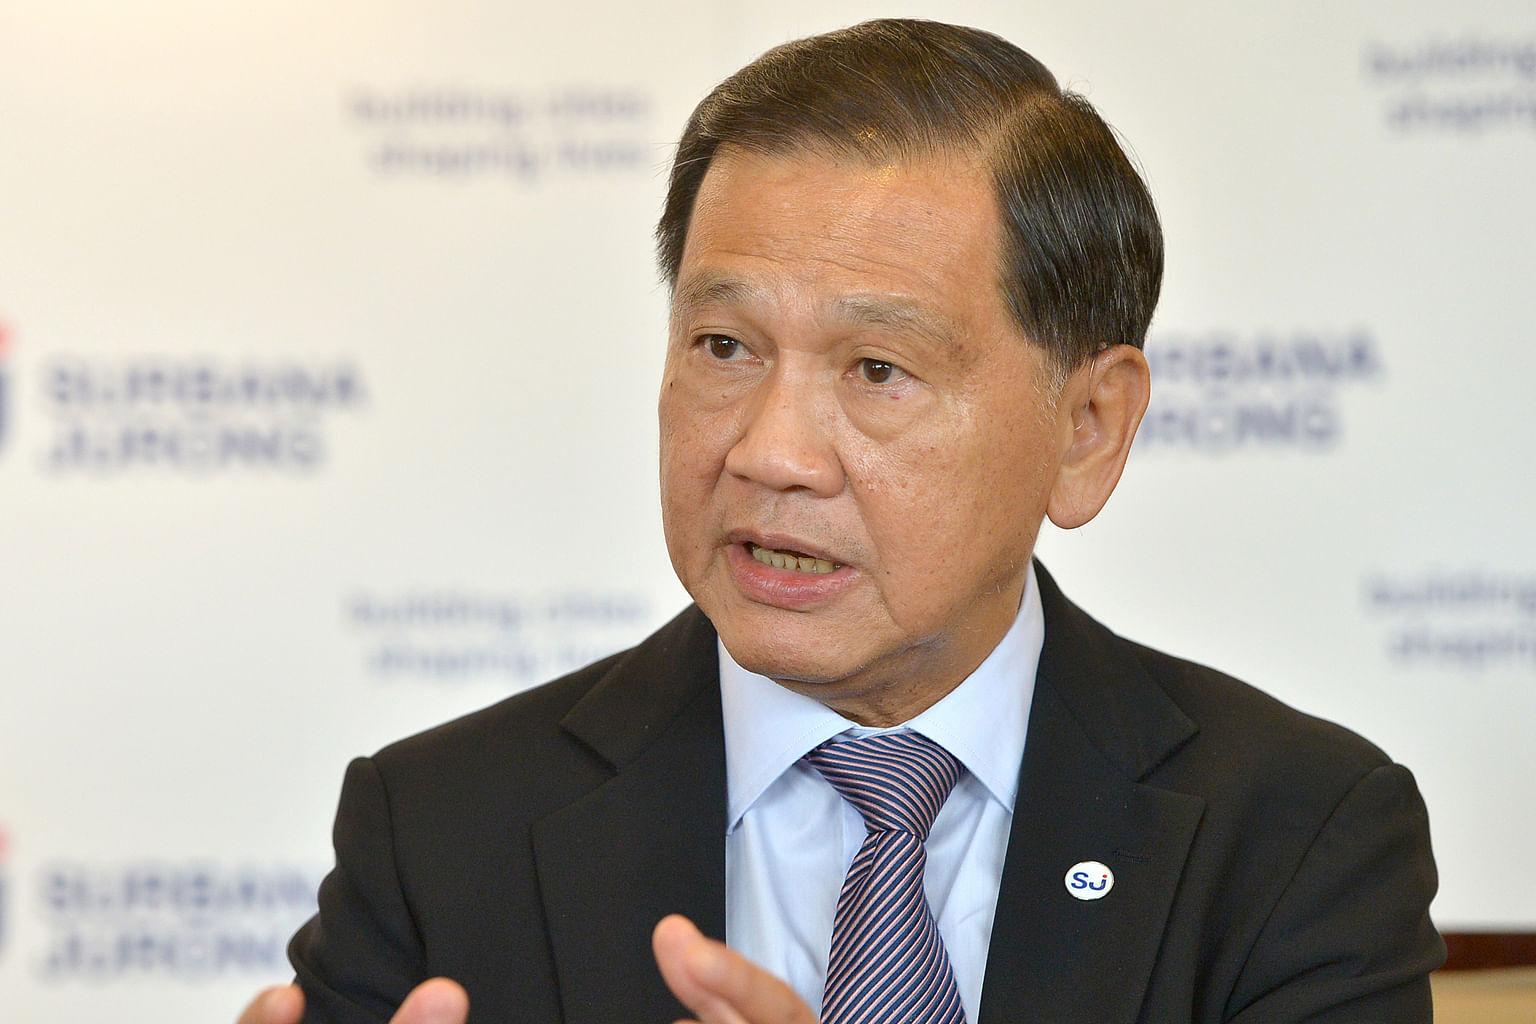 Singapore Surbana Jurong buys Australian SMEC to create consulting giant 48